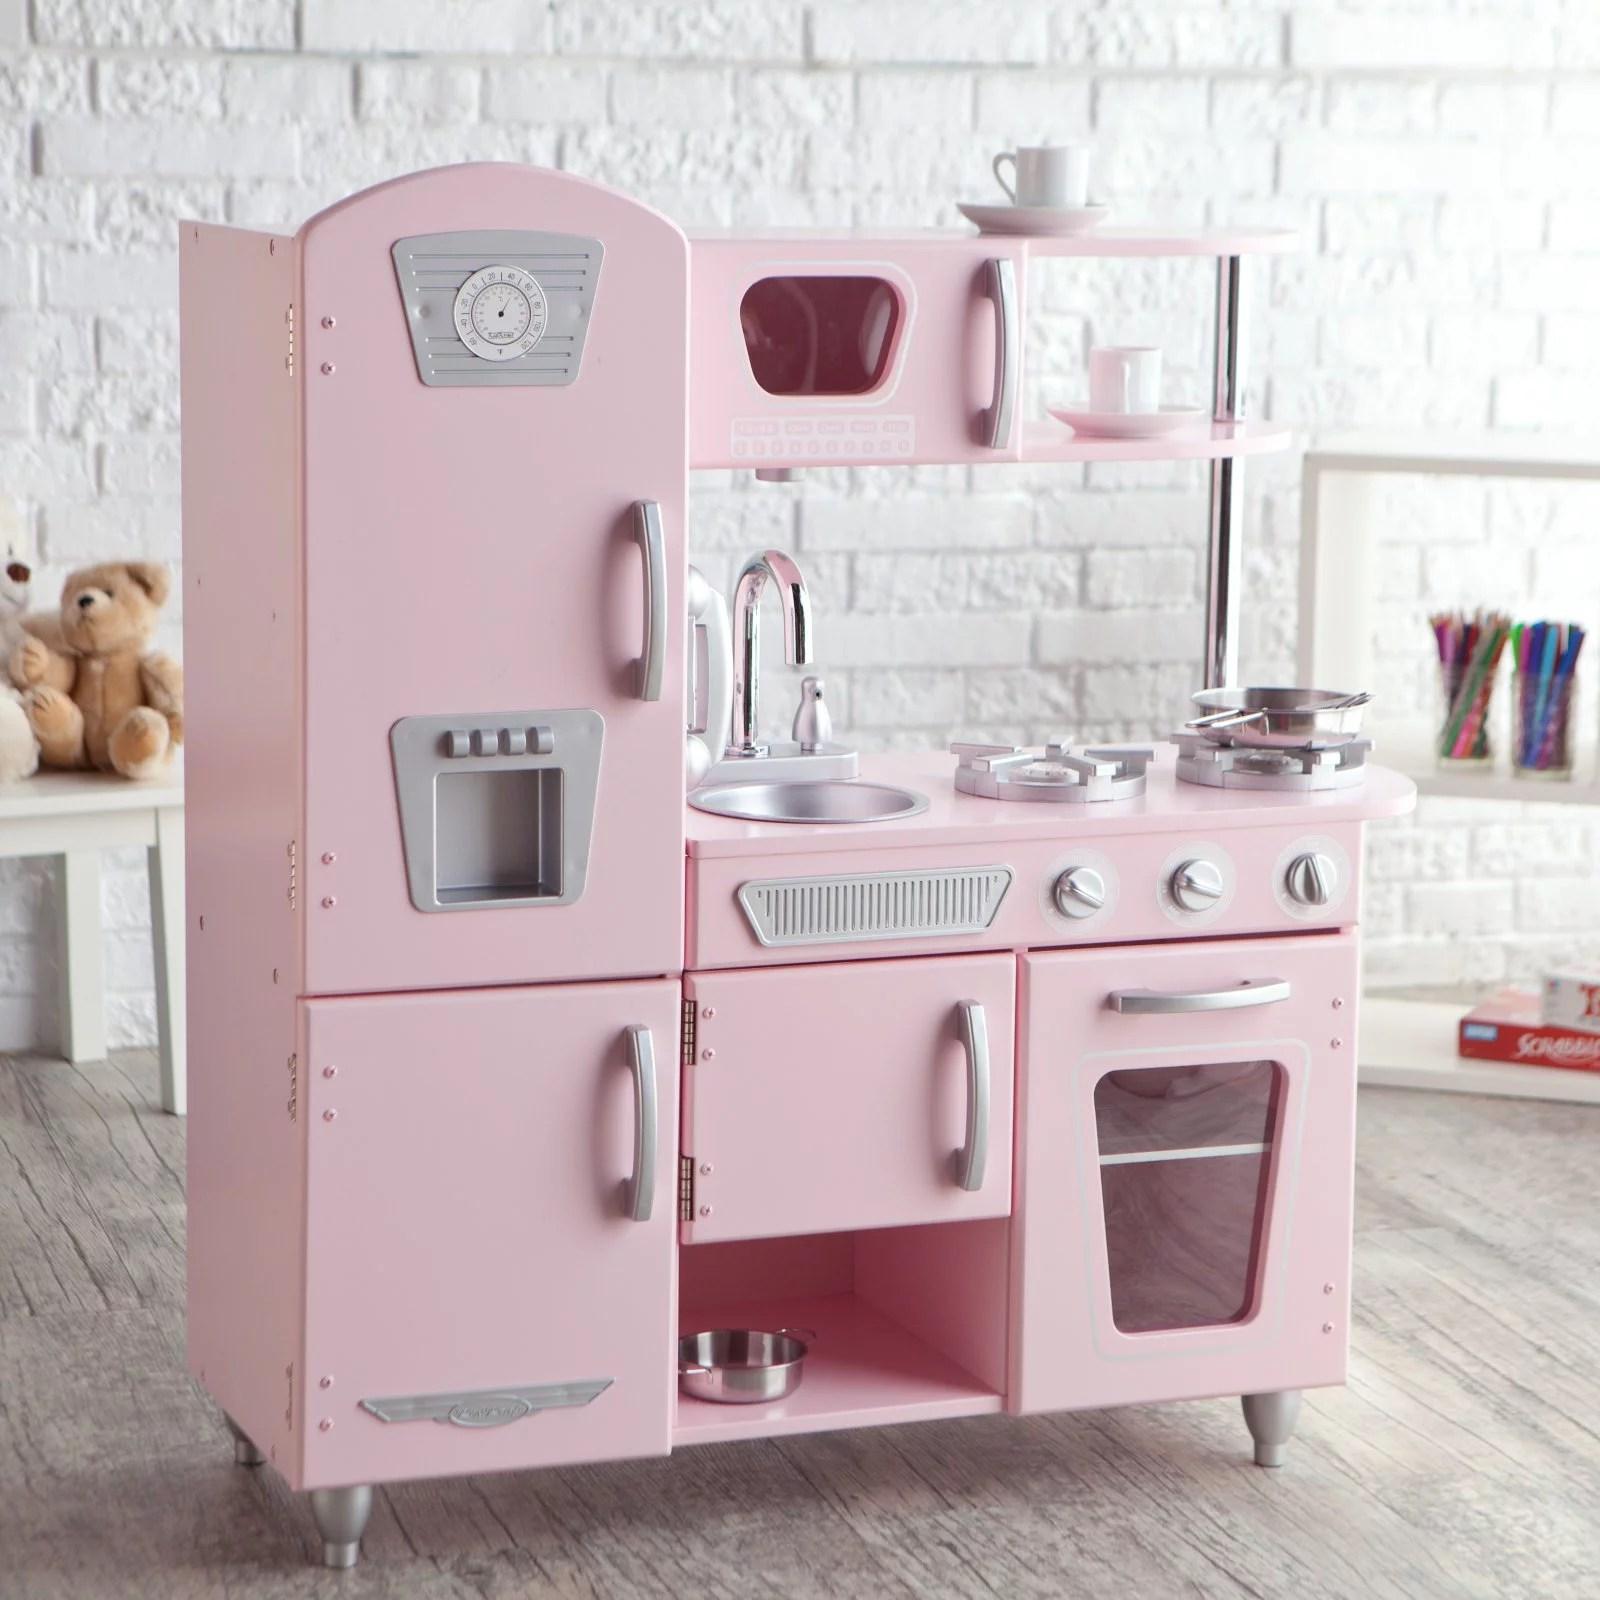 KidKraft Vintage Wooden Play Kitchen in Pink  Walmartcom